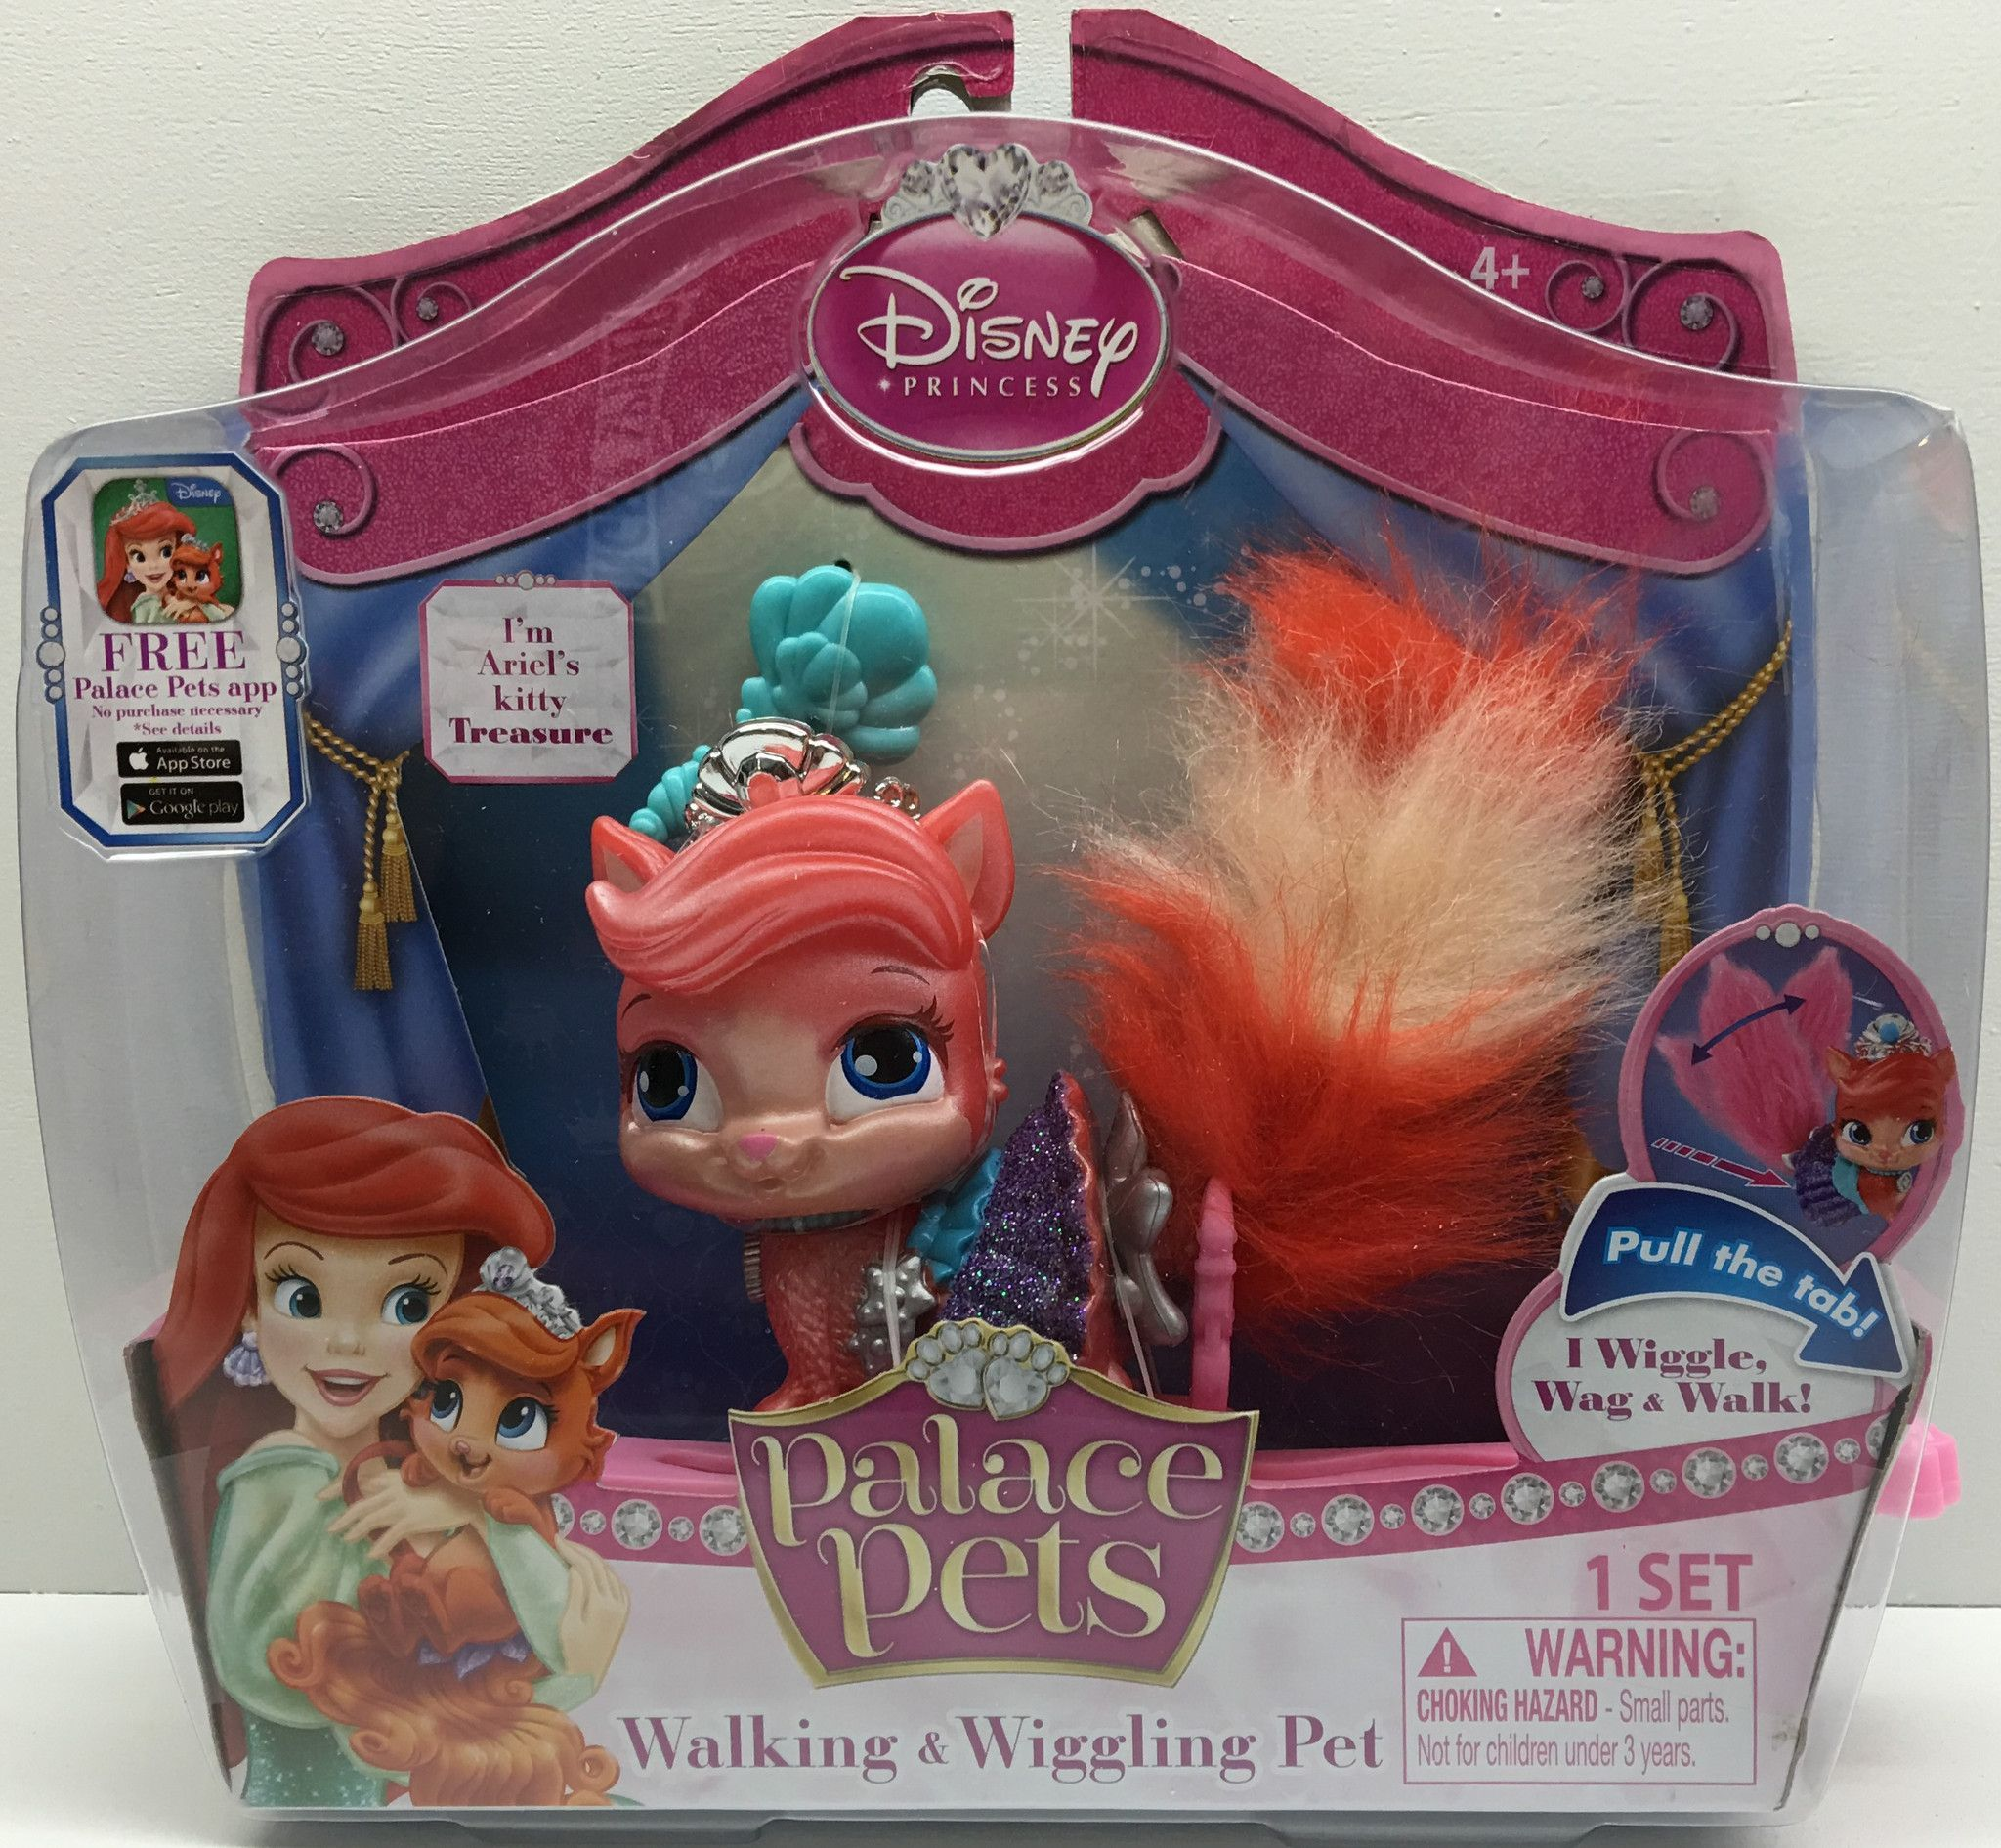 Tas032412 2014 Disney Princess Palace Pets Ariel S Kitty